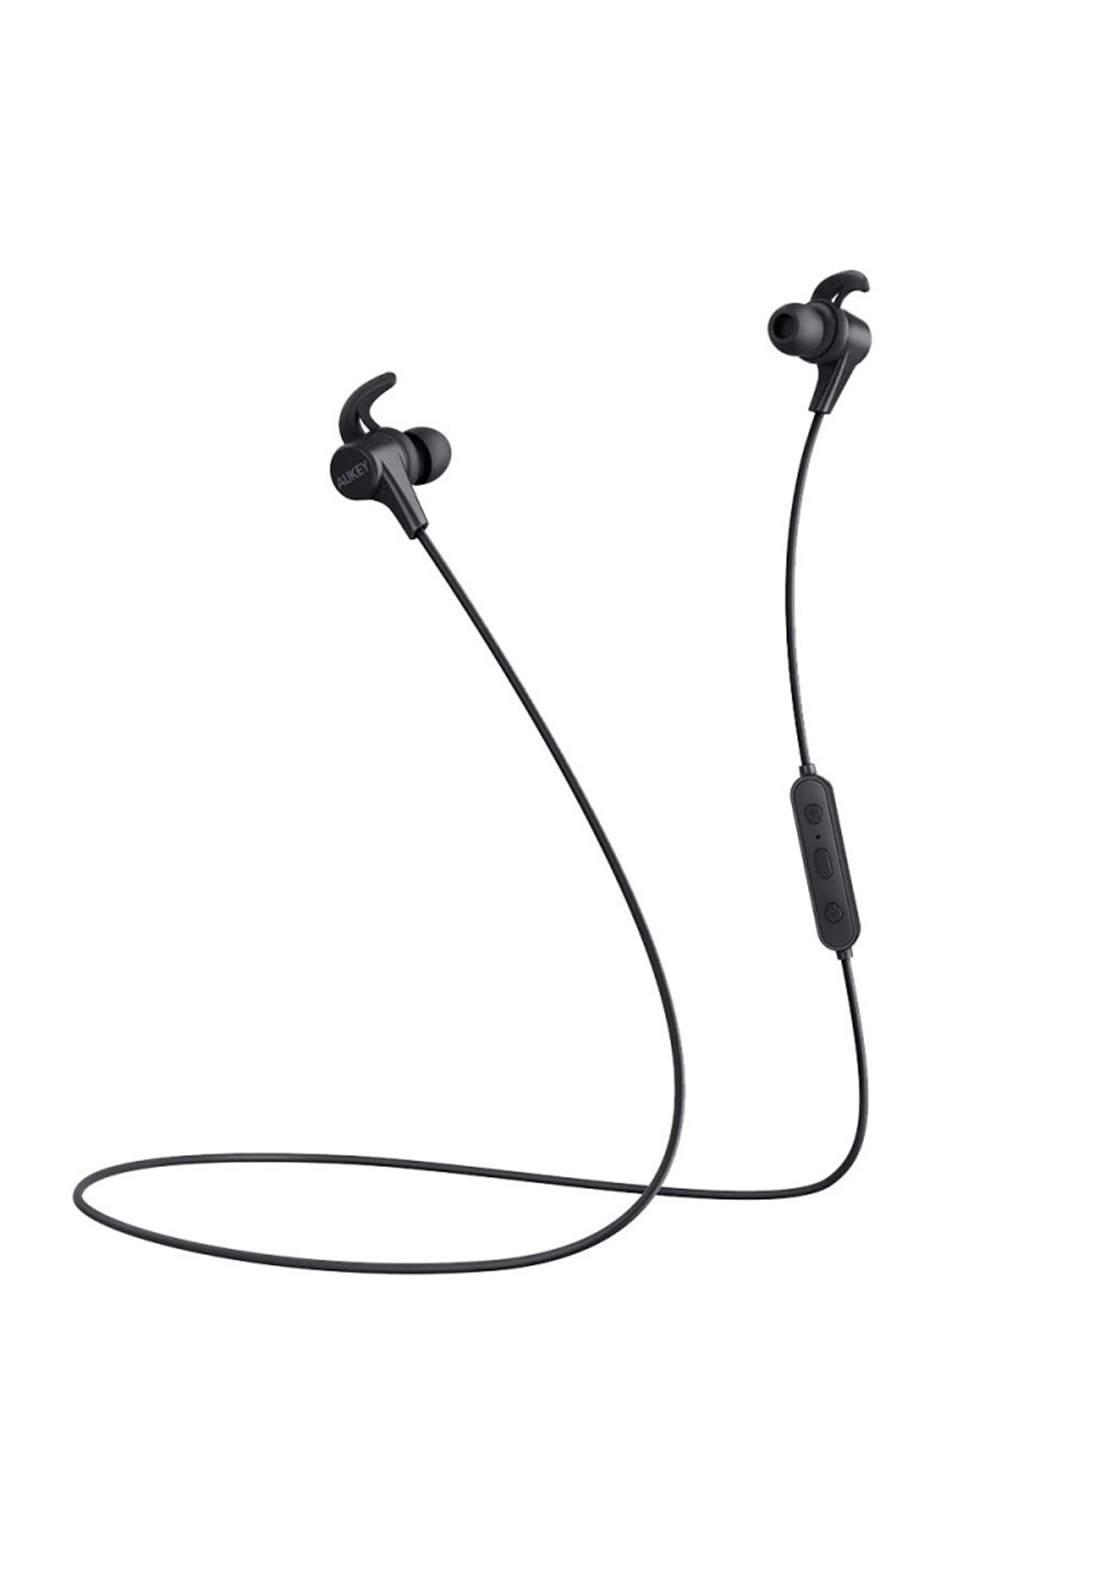 Aukey EP-B40S Latitude Lite  Wireless  Bluetooth Earbuds - Black  سماعة